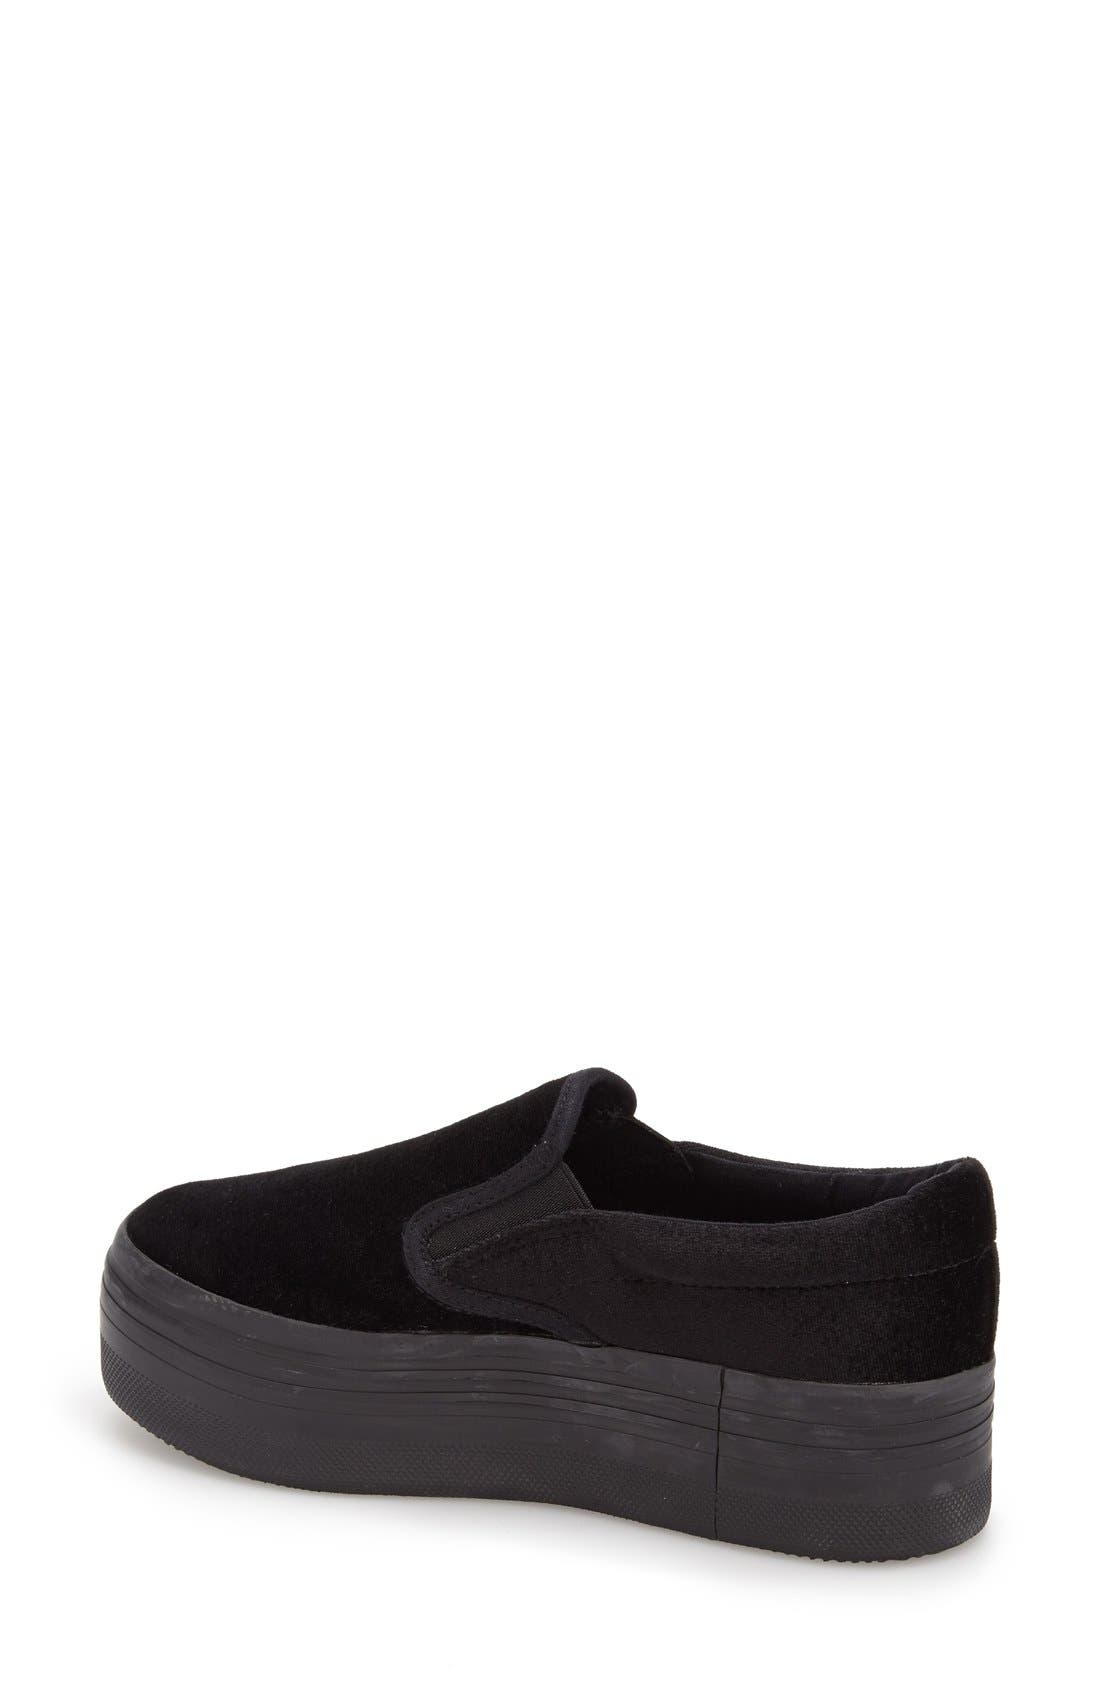 Alternate Image 2  - Jeffrey Campbell 'See-Ya' Slip-On Platform Sneaker (Women)